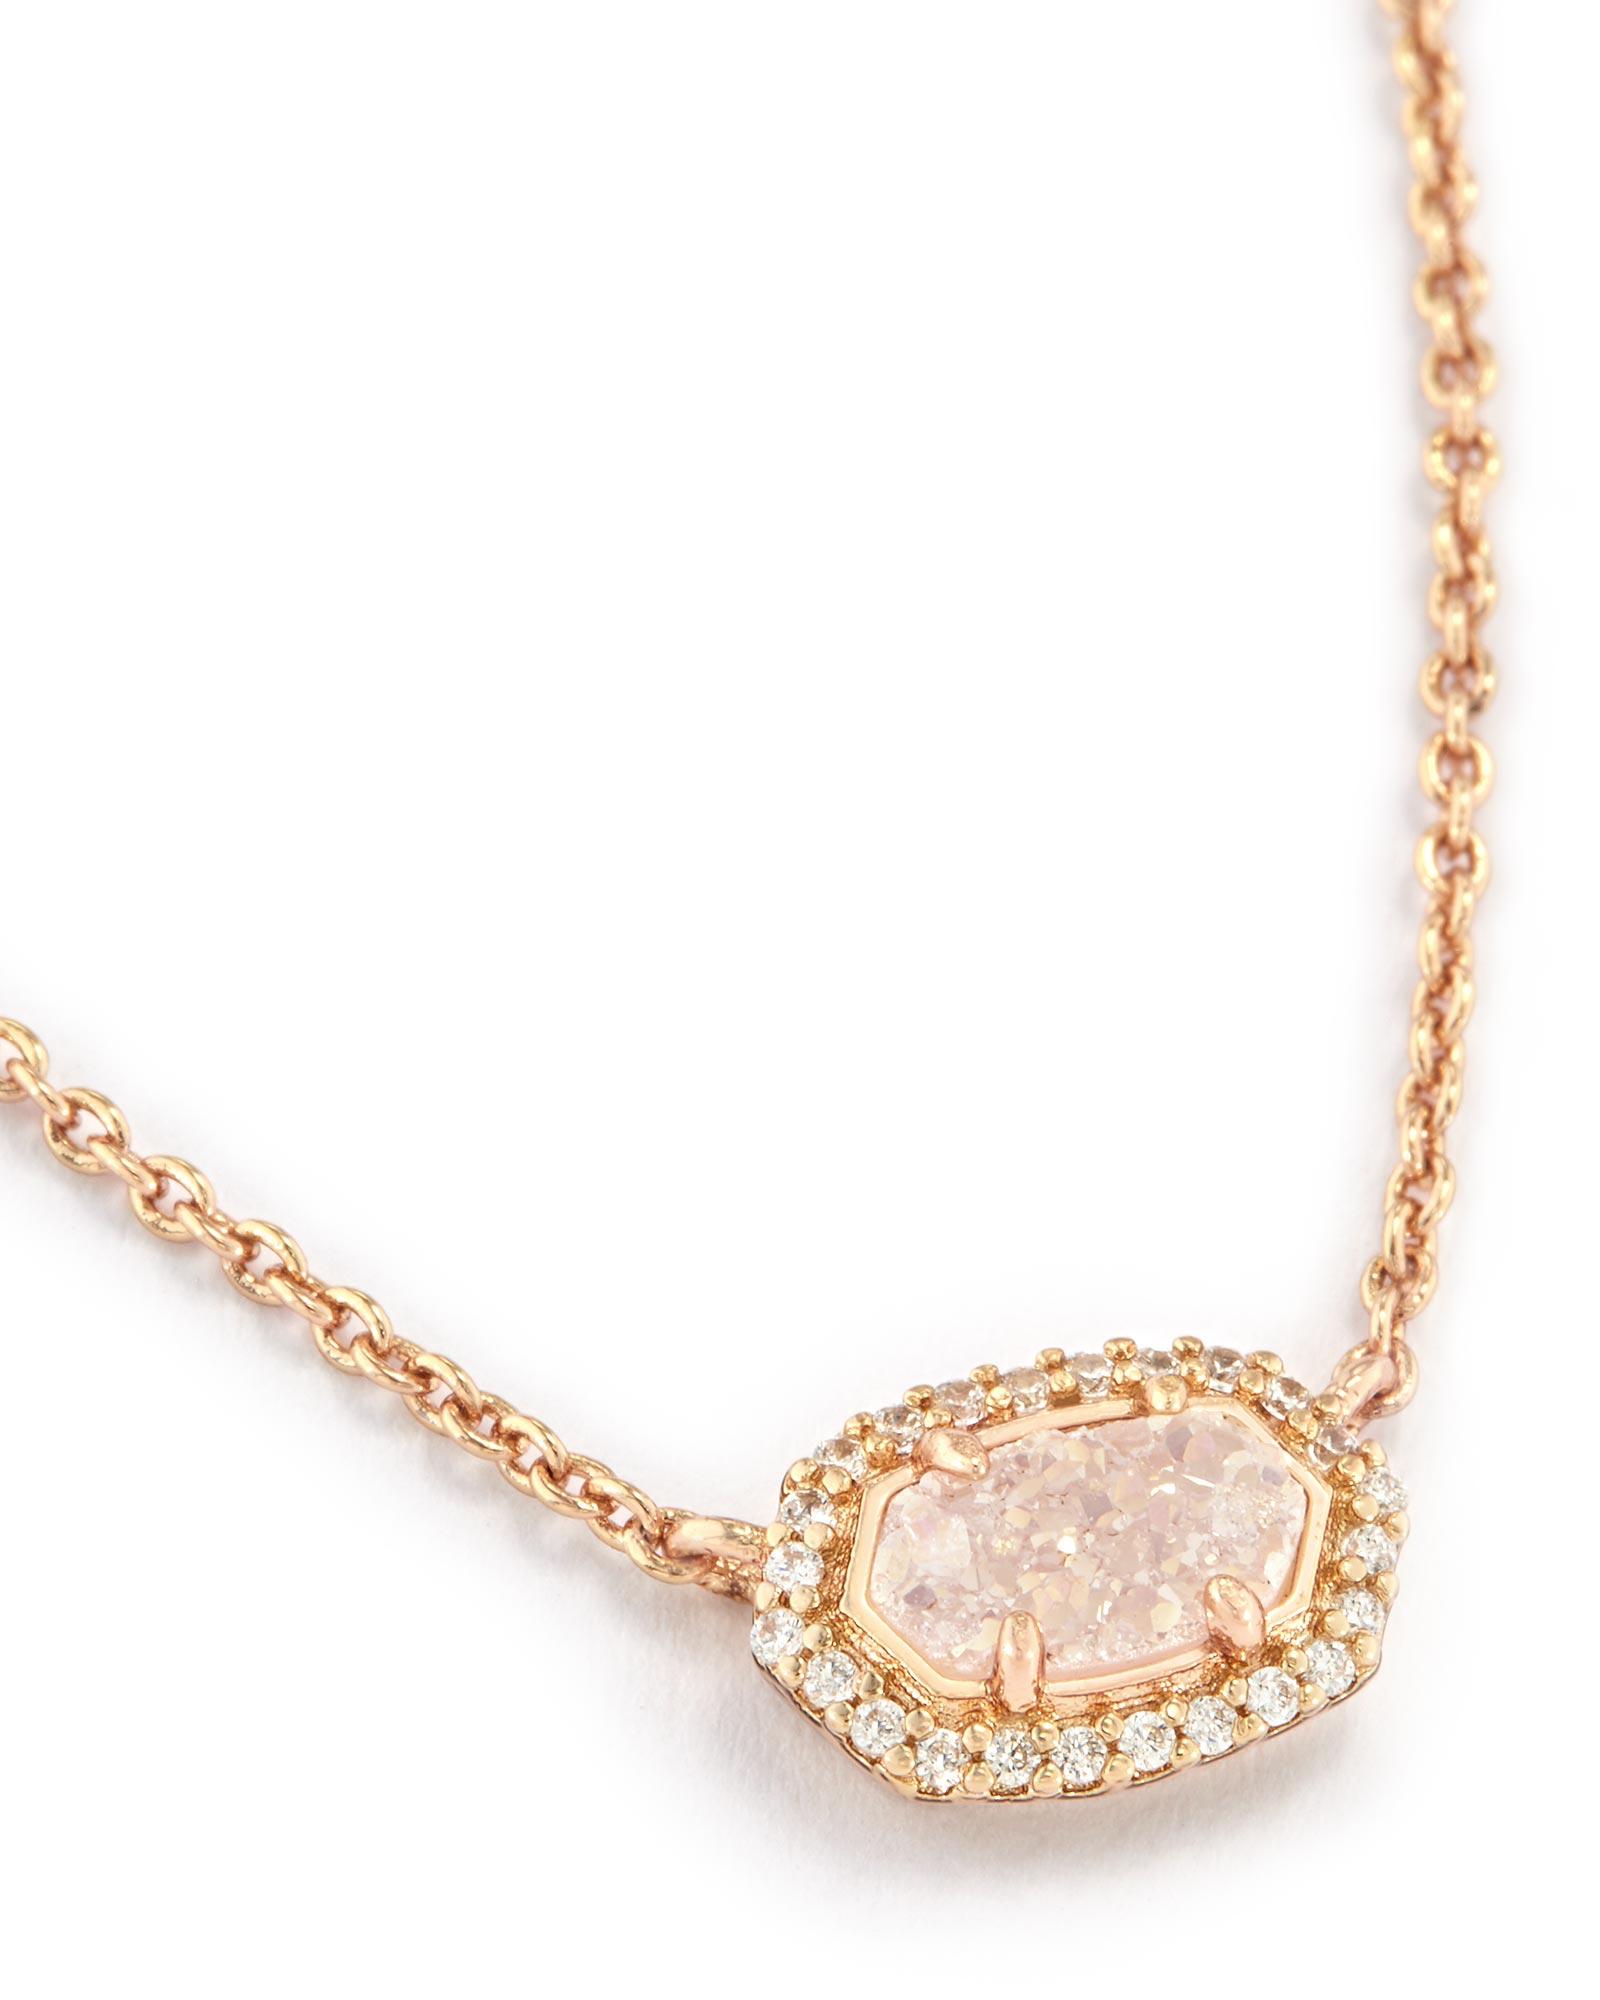 Chelsea Rose Gold Pendant Choker Necklace Kendra Scott